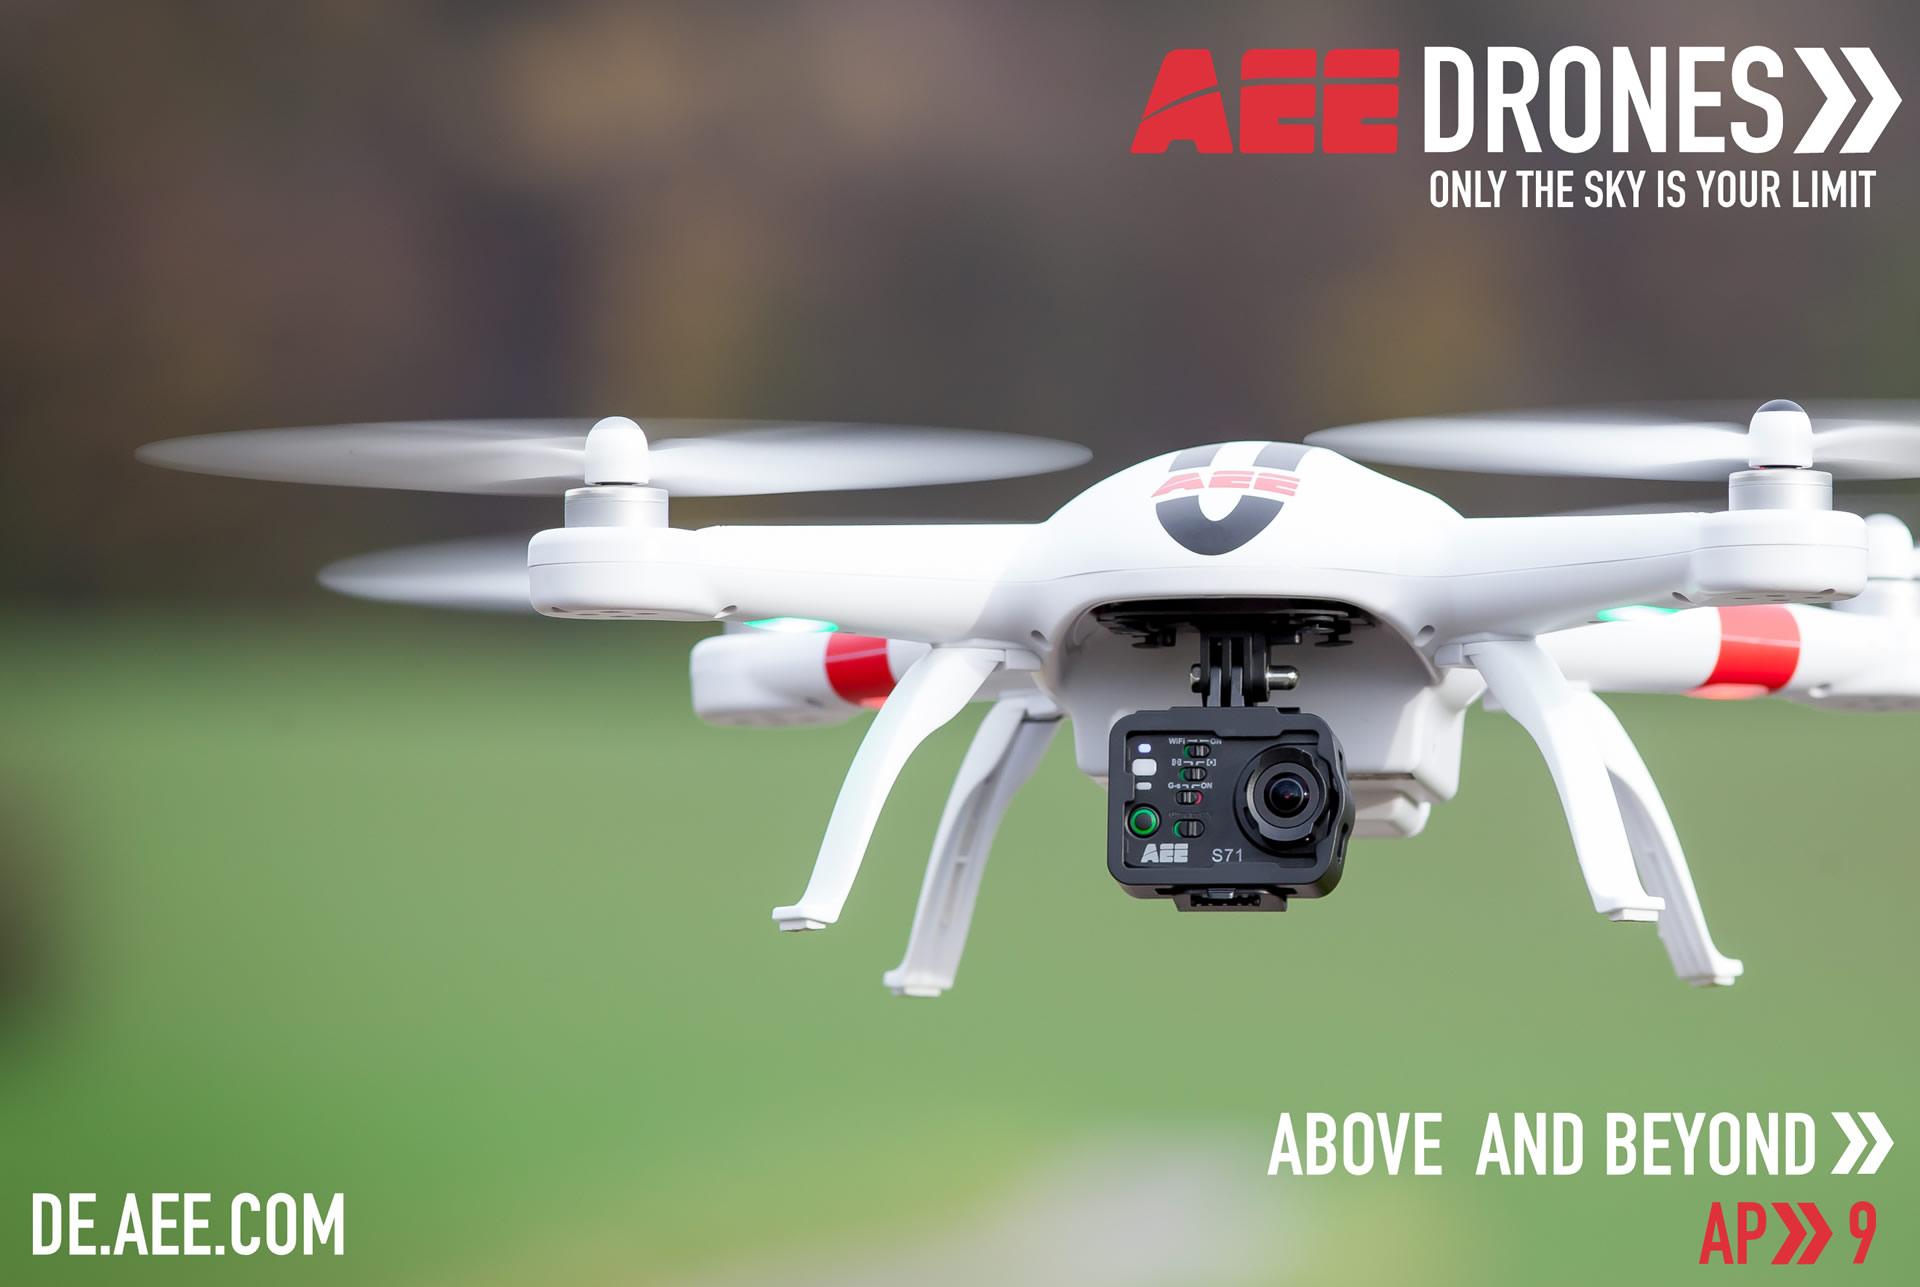 Ap9产品图-AEE航拍无人机海外应用